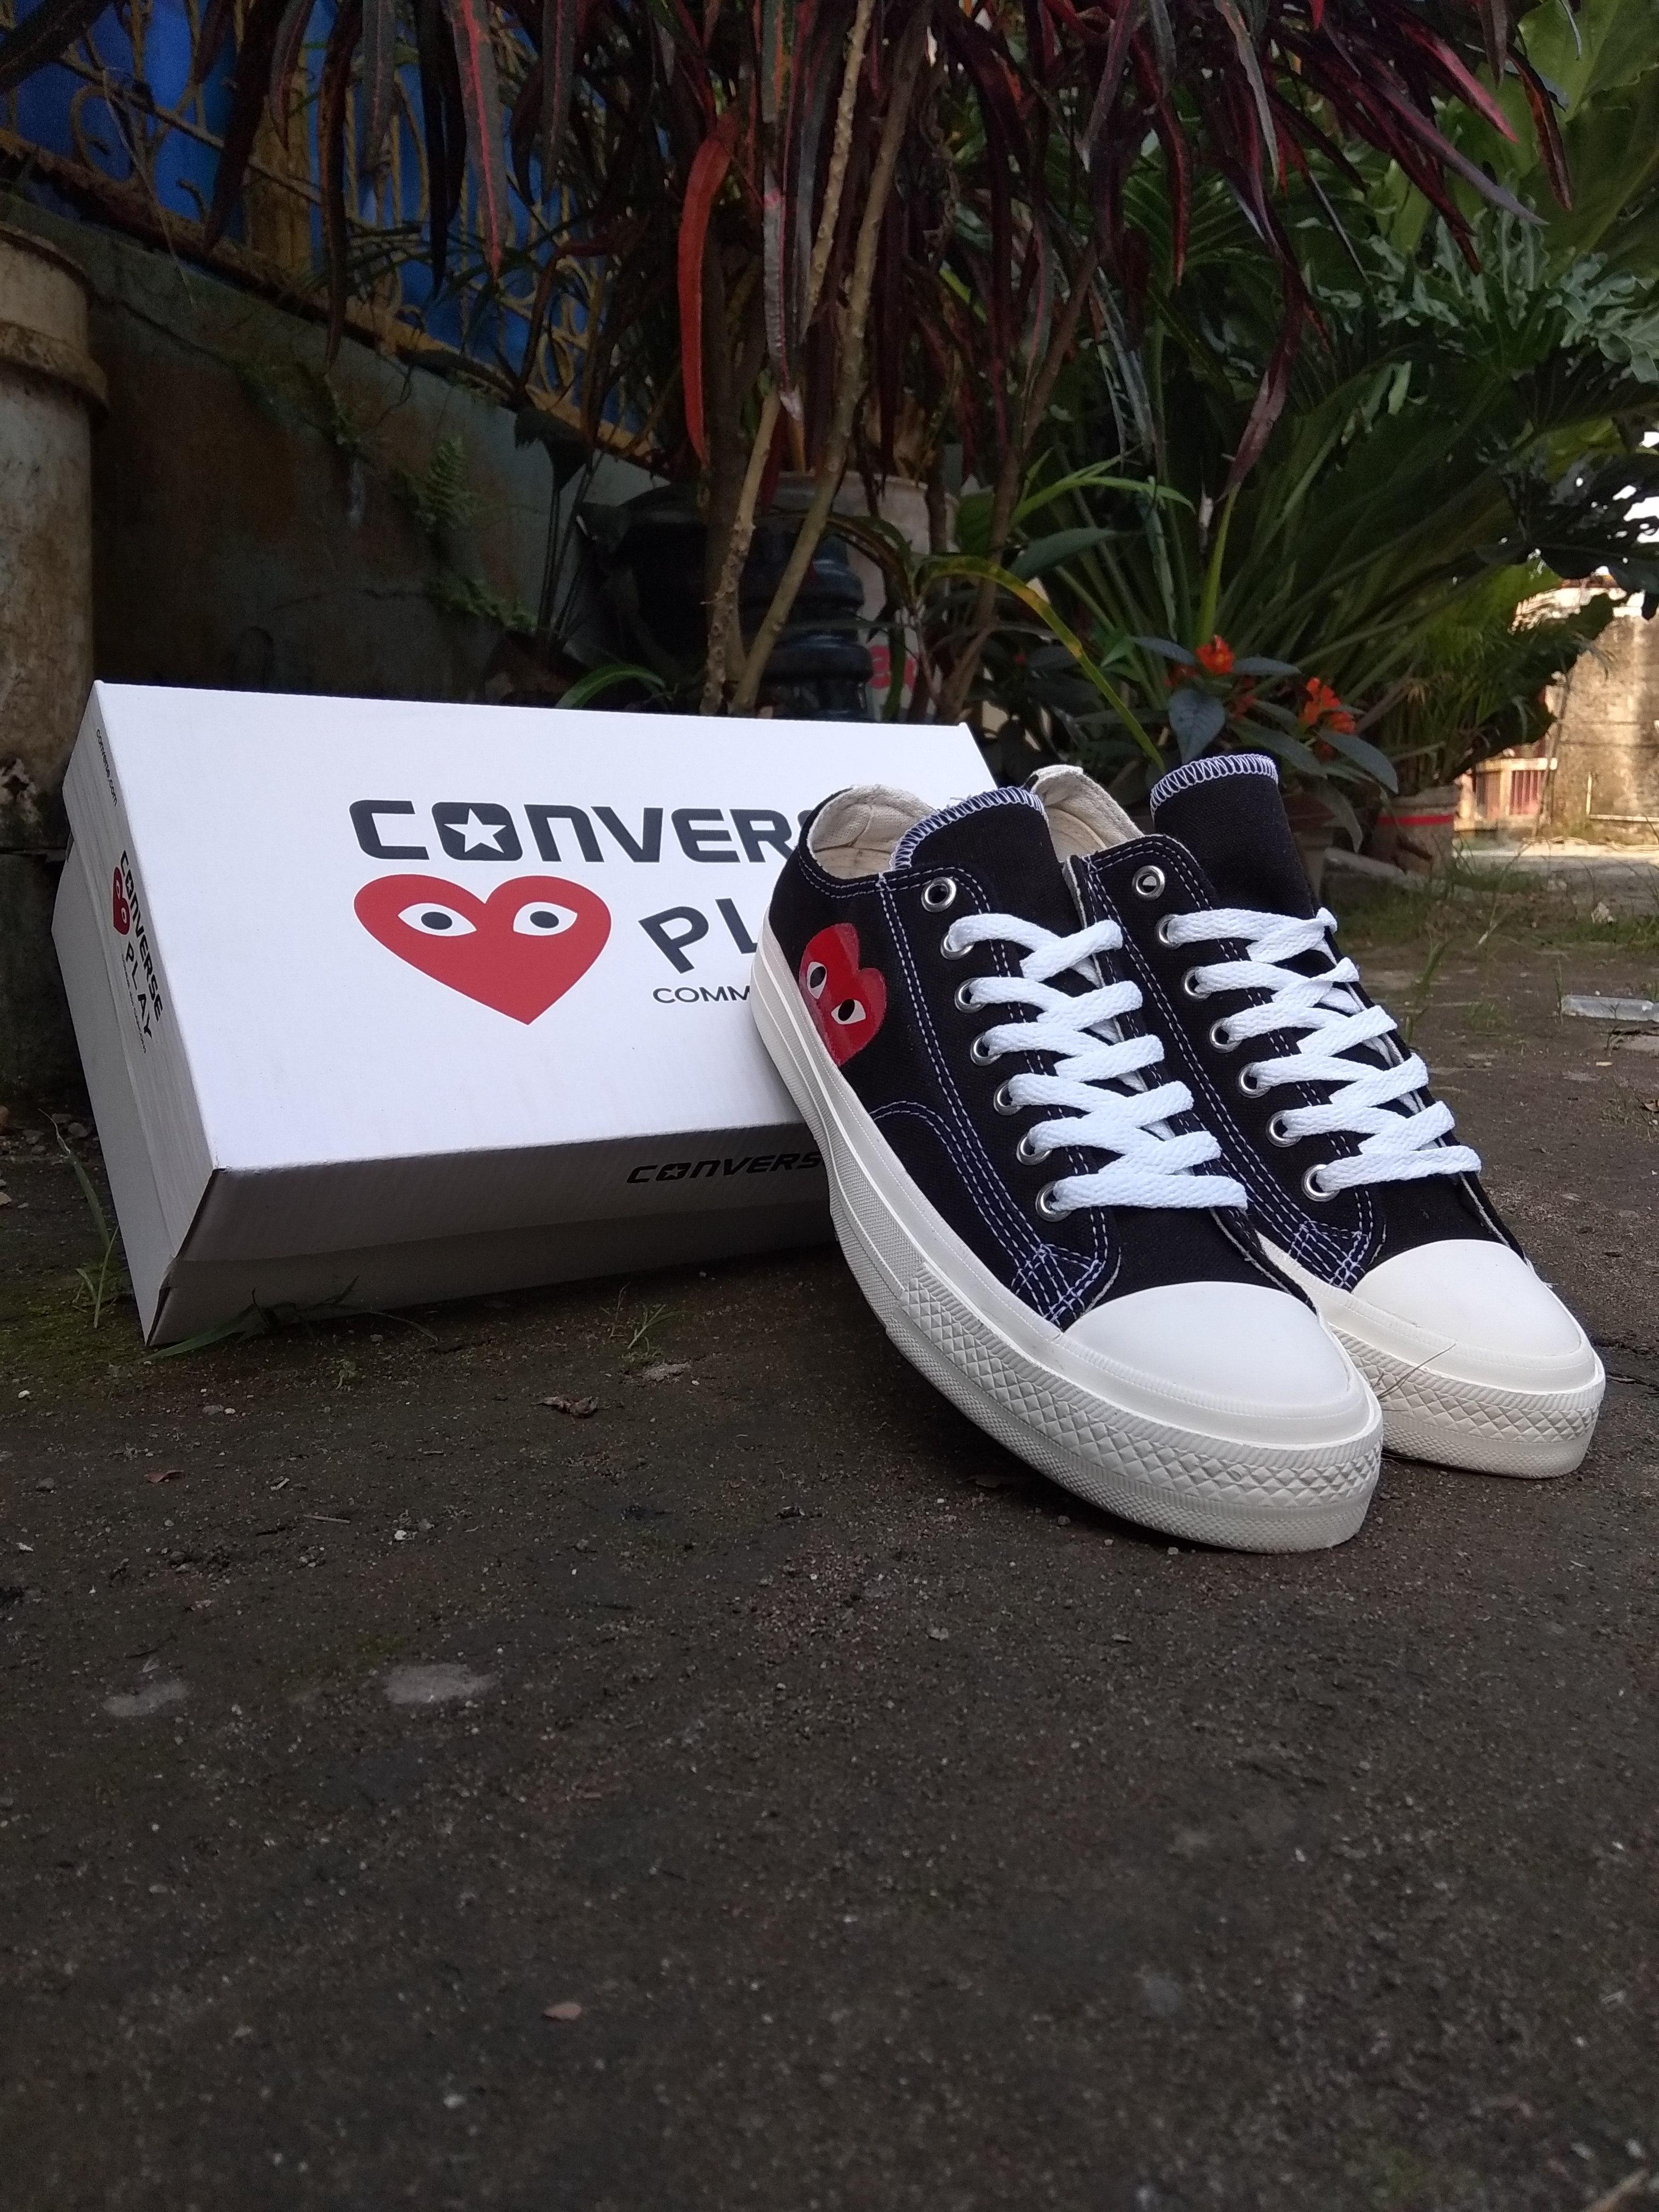 Sepatu Converse CDG Play Made In Vietnam Premium Black White Low